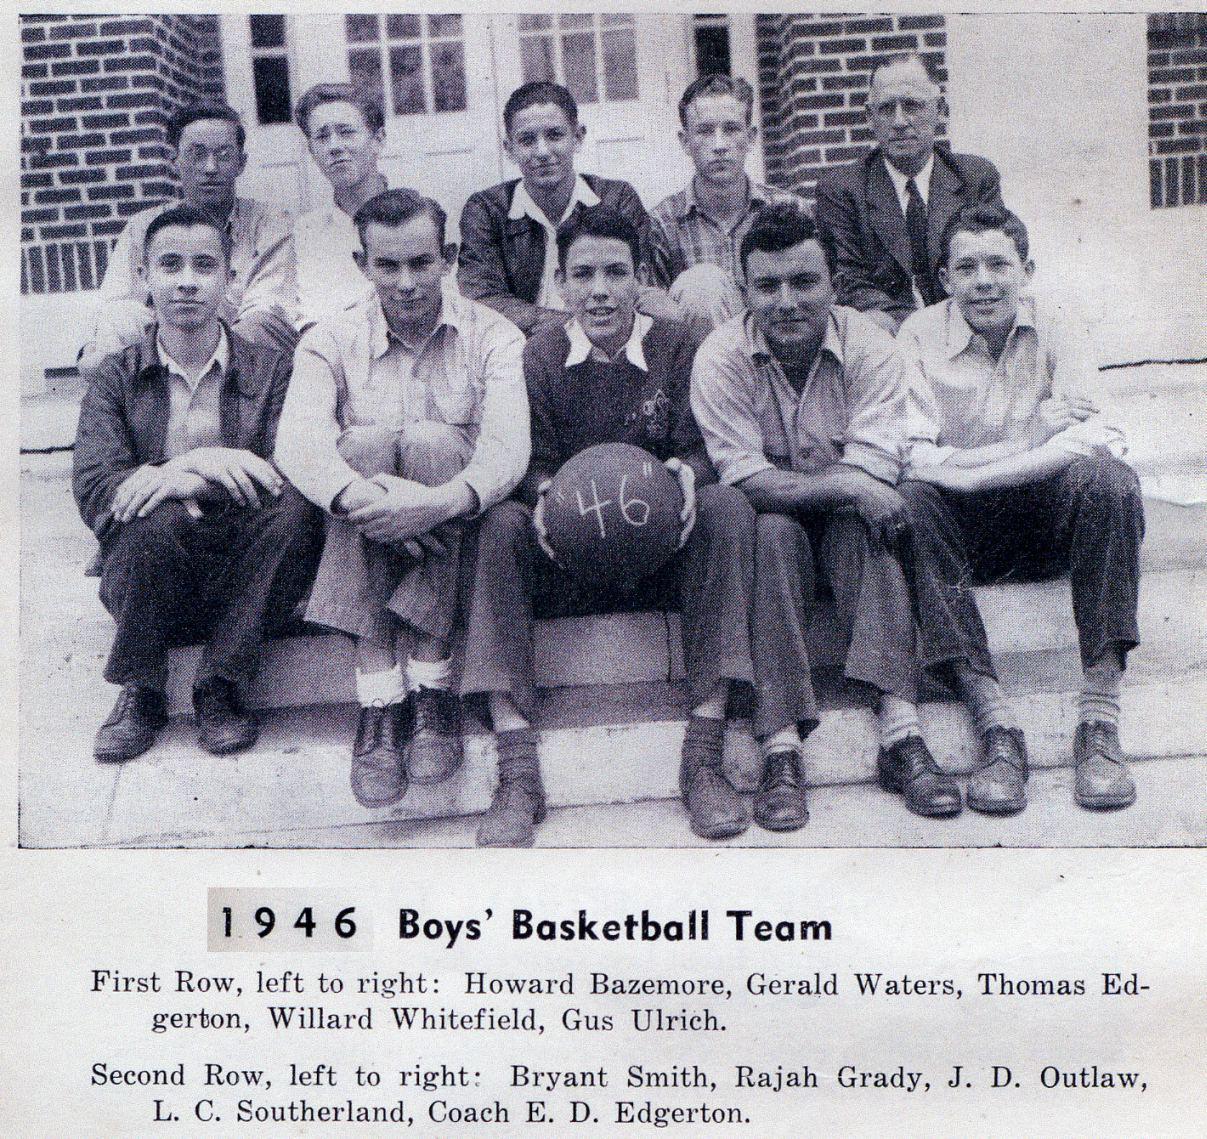 BFG 1946 Boys' Basketball Team